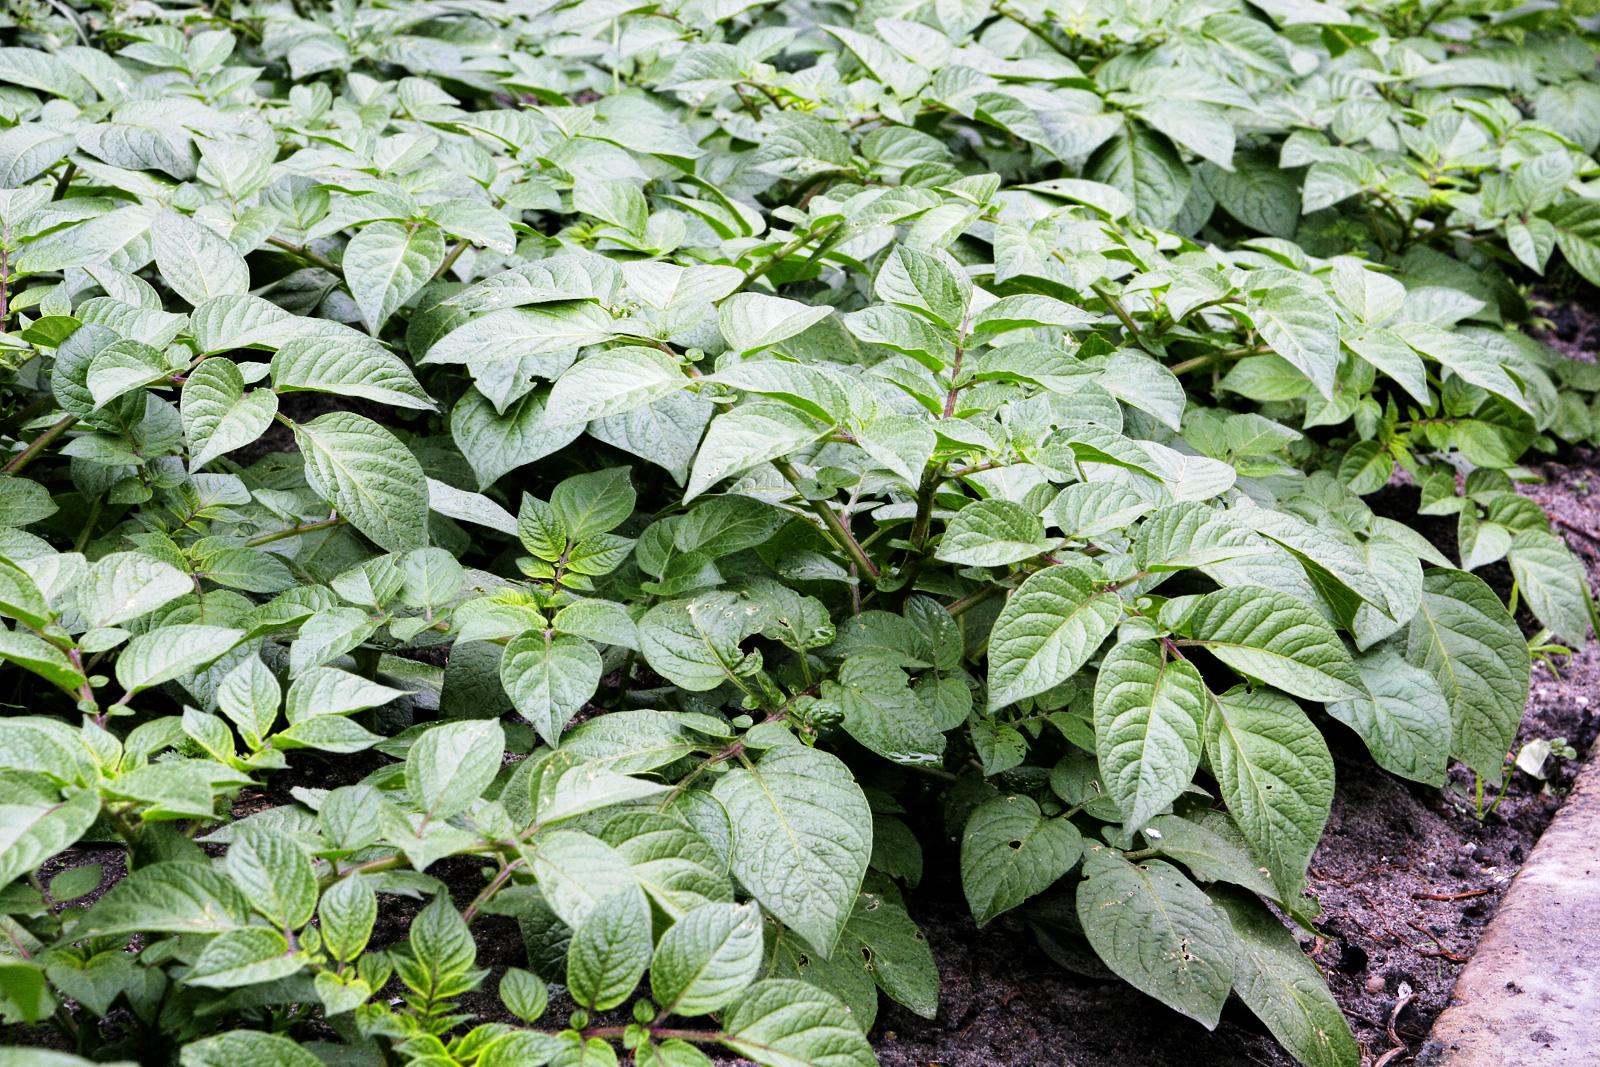 What Plants Look Like Potatoes